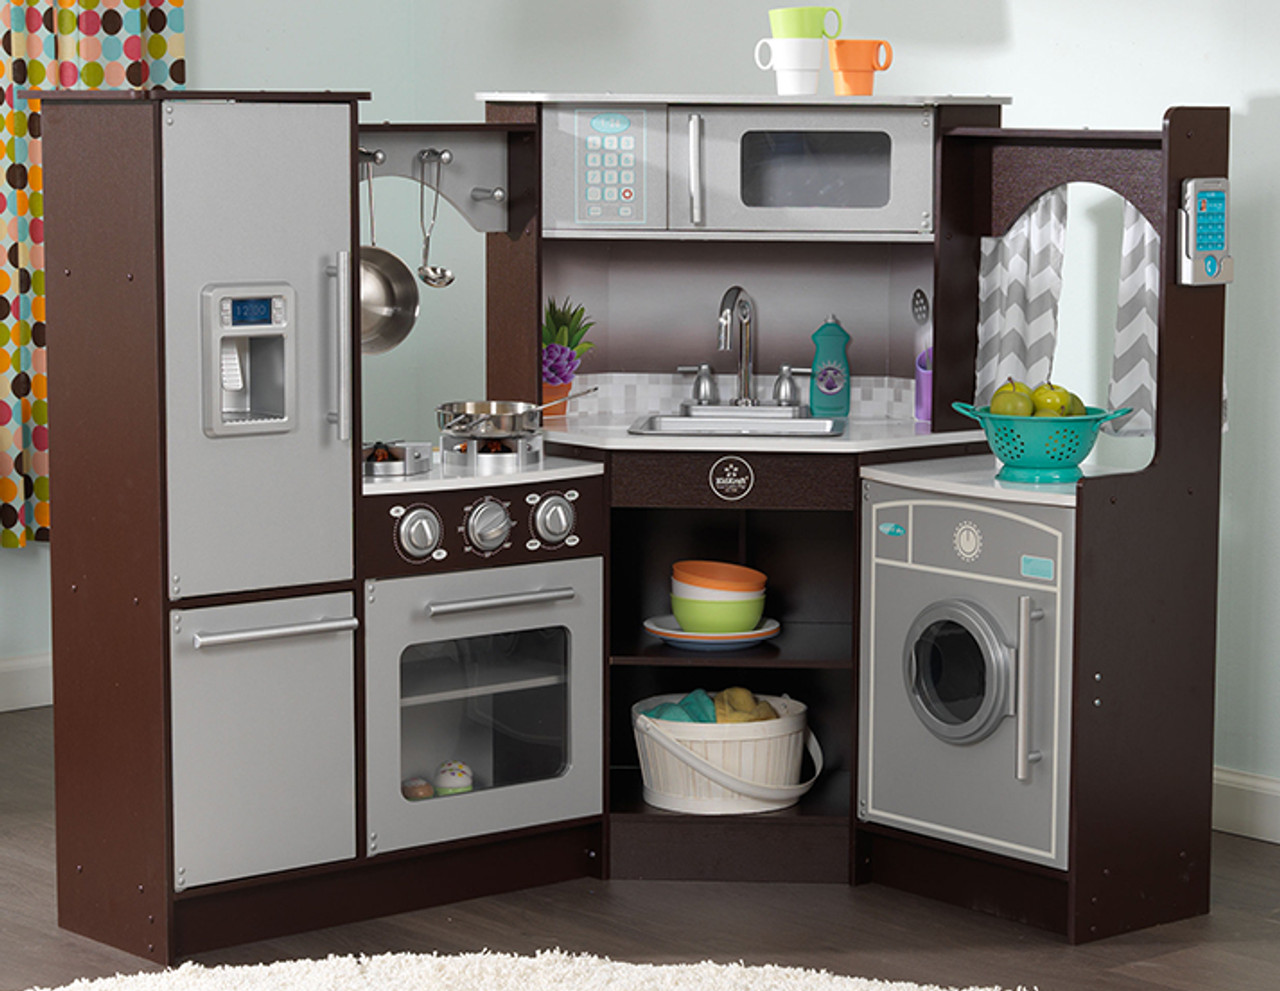 Superbe KidKraft Ultimate Corner Play Kitchen With Lights U0026 Sounds